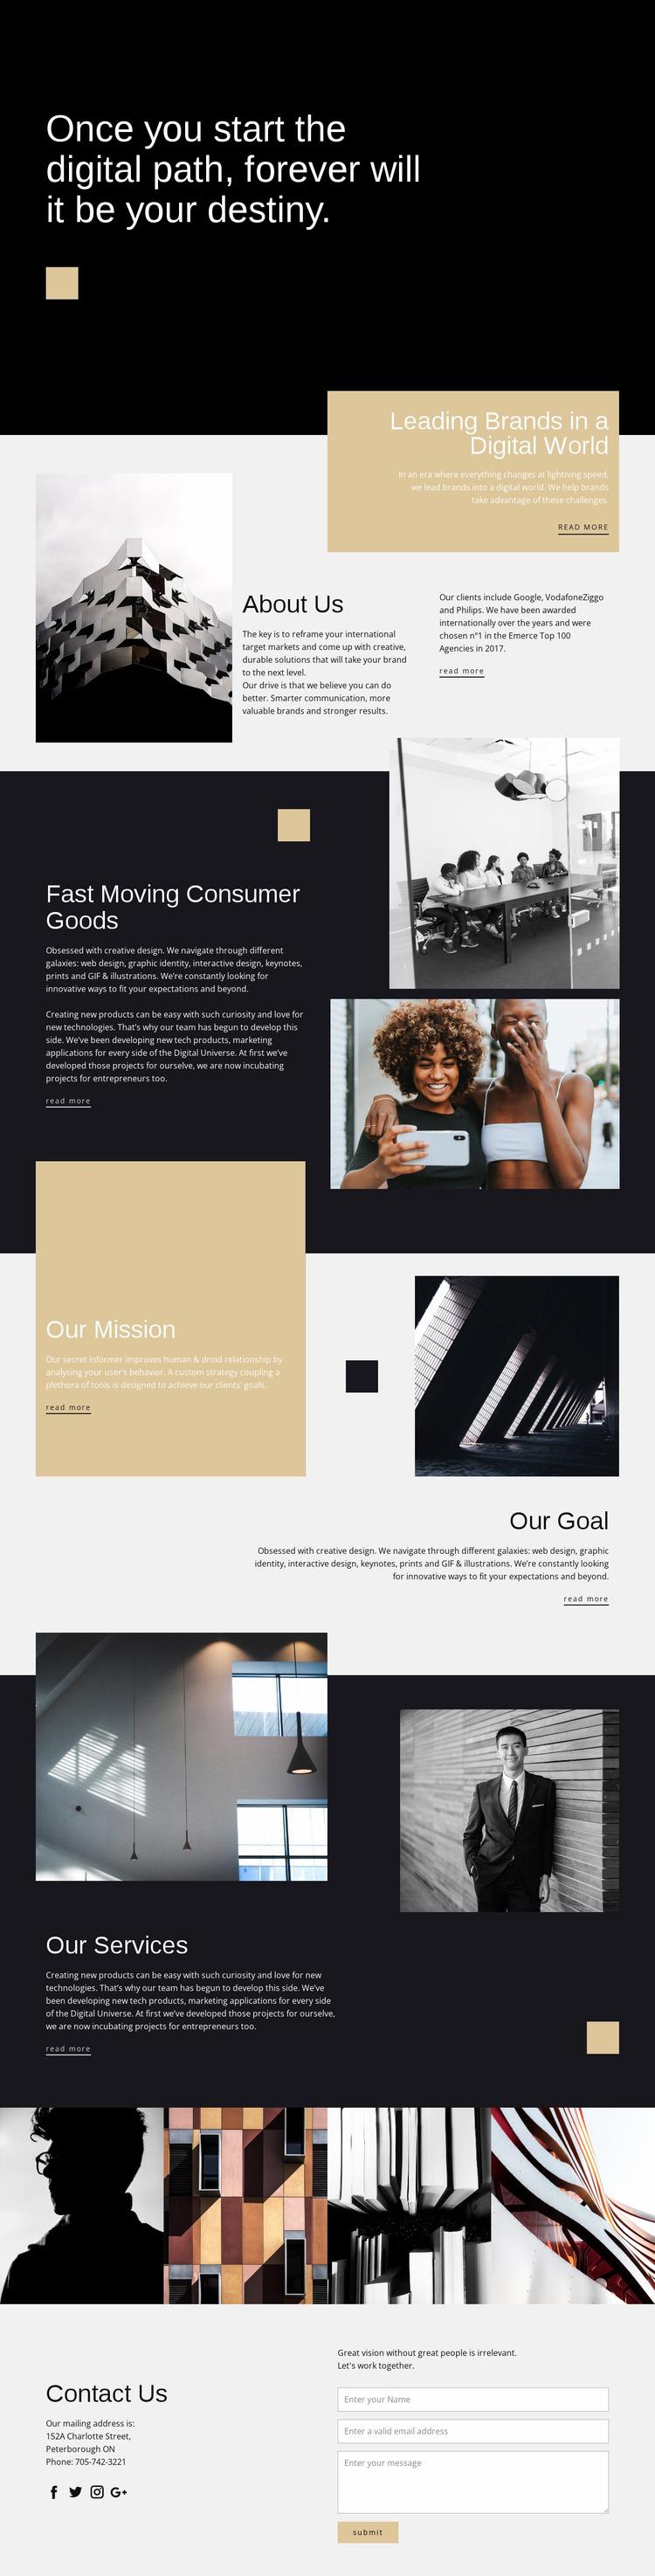 Destiny photo studio Html Website Builder